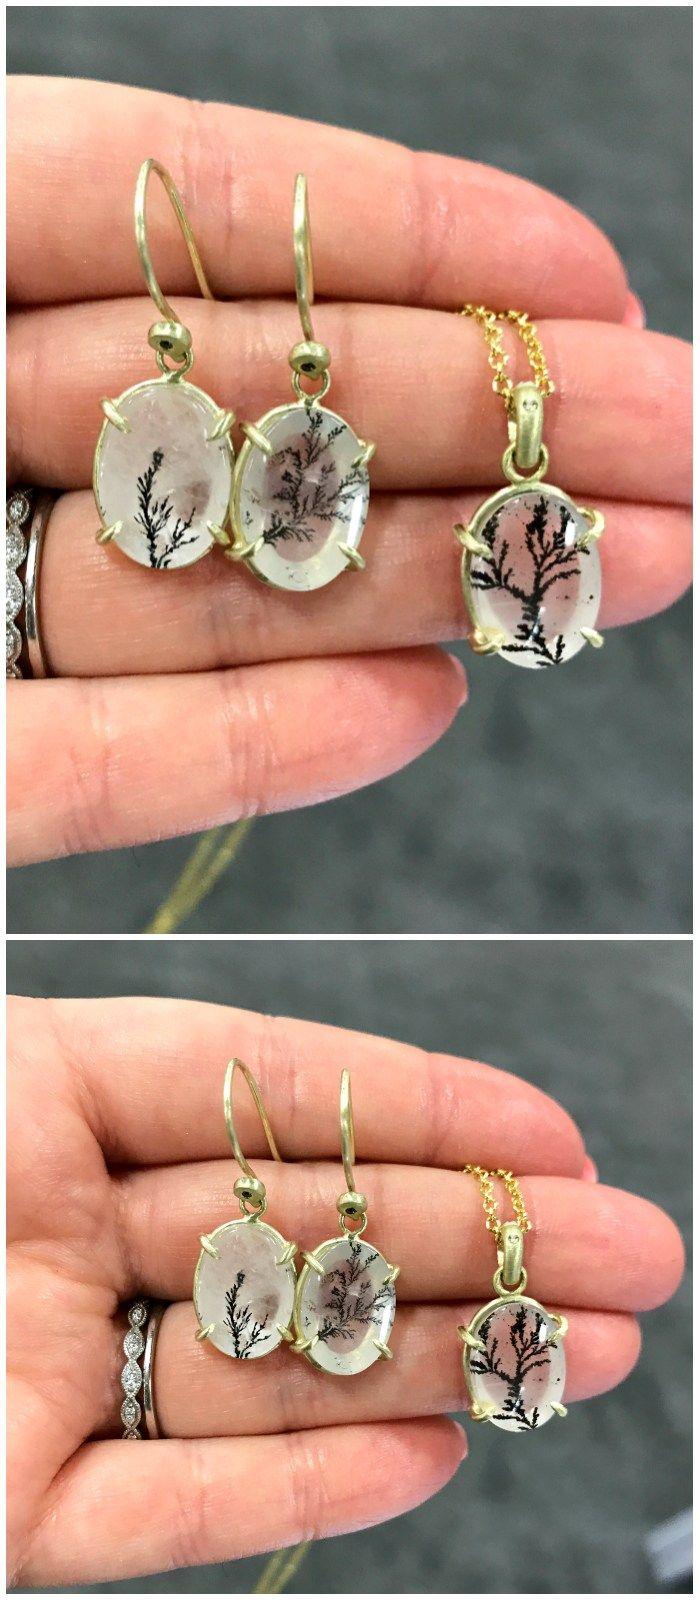 Three beautiful pieces of dendritic quartz jewelry from Judi Powers.